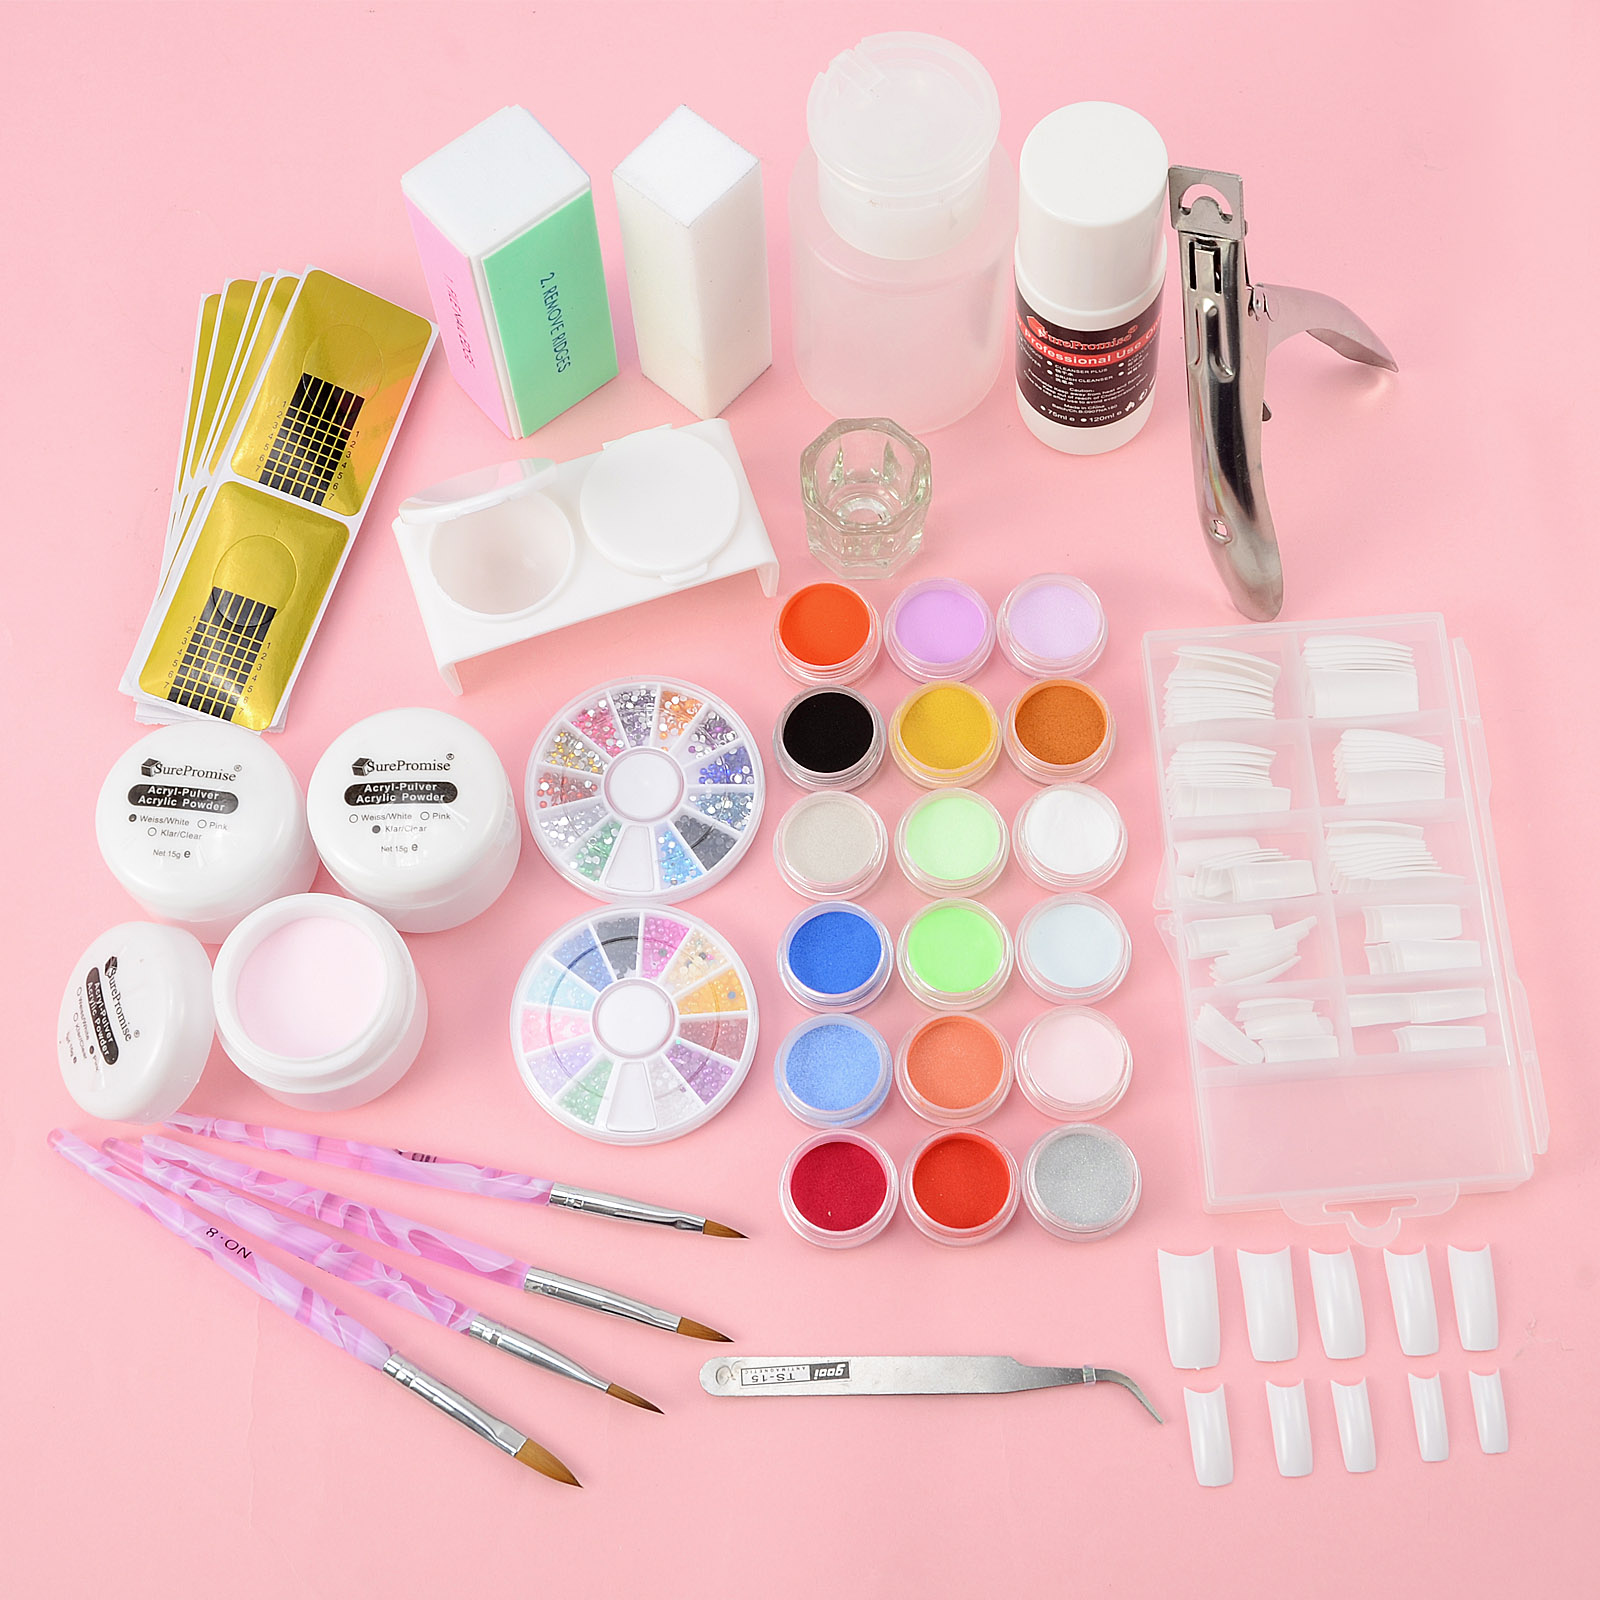 Nail Art Starter Kit: 14in1 Nail Art Starter Kit Acrylic Liquid Color Powder